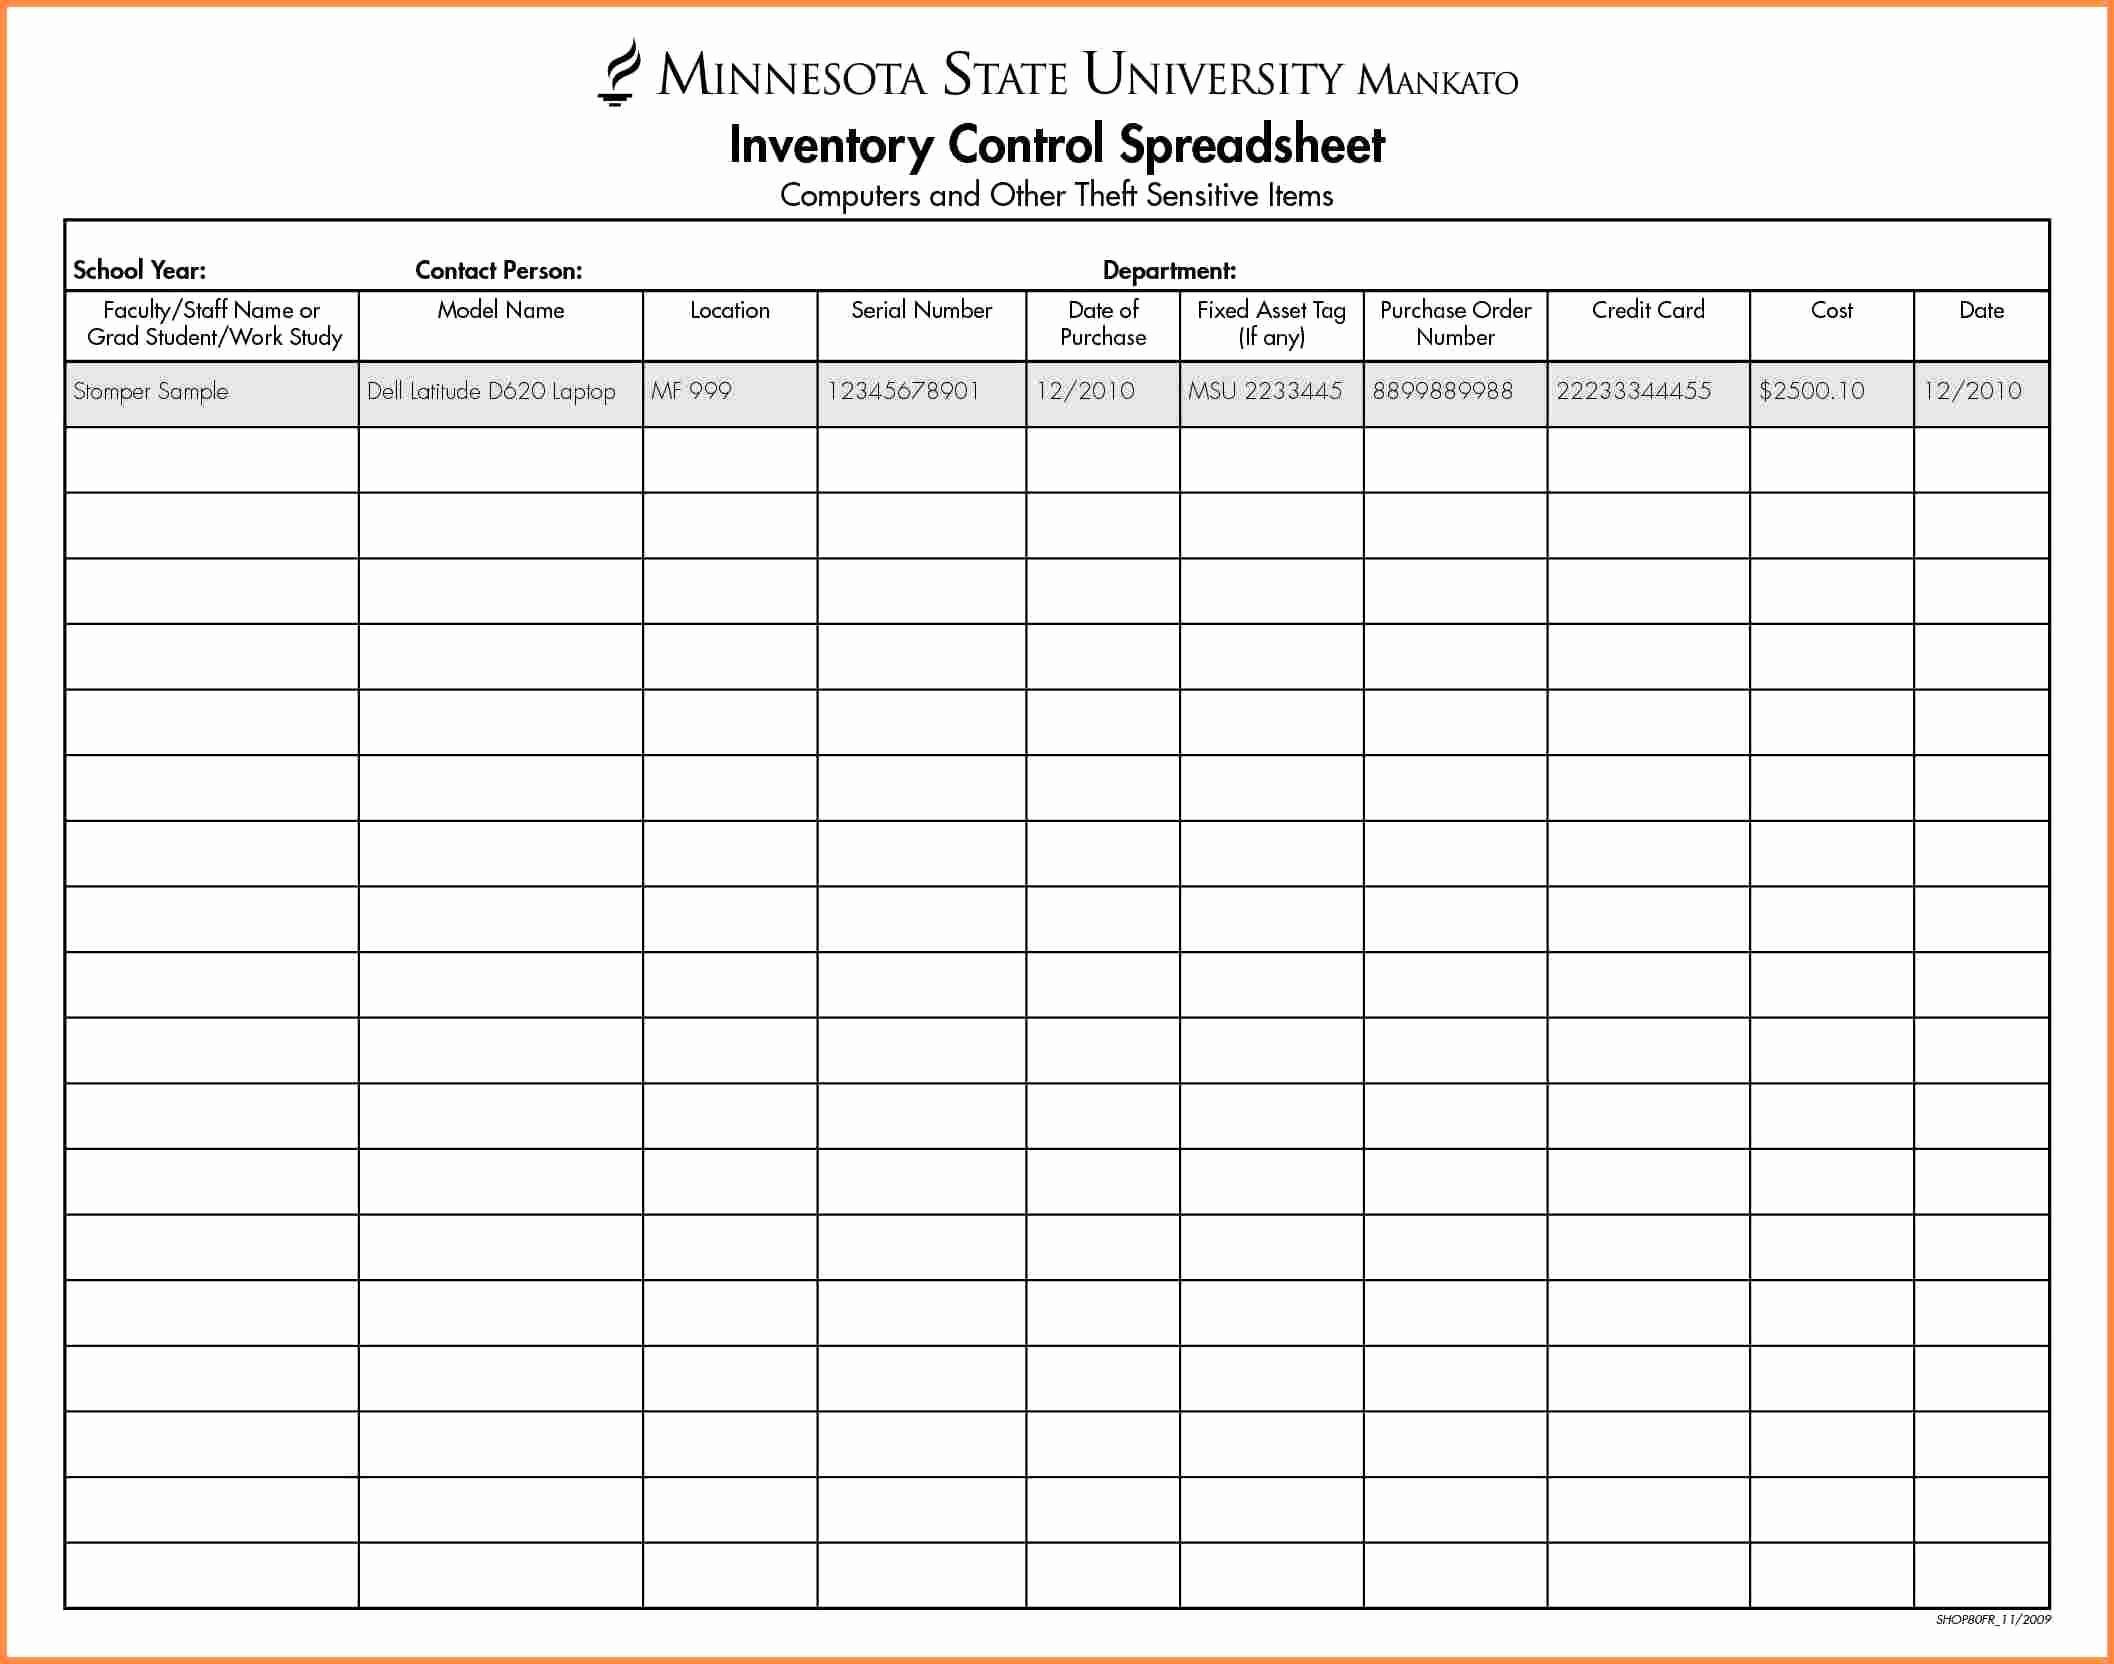 Bakery Inventory Spreadsheet 9 | Khairilmazri With Bakery Inventory Spreadsheet